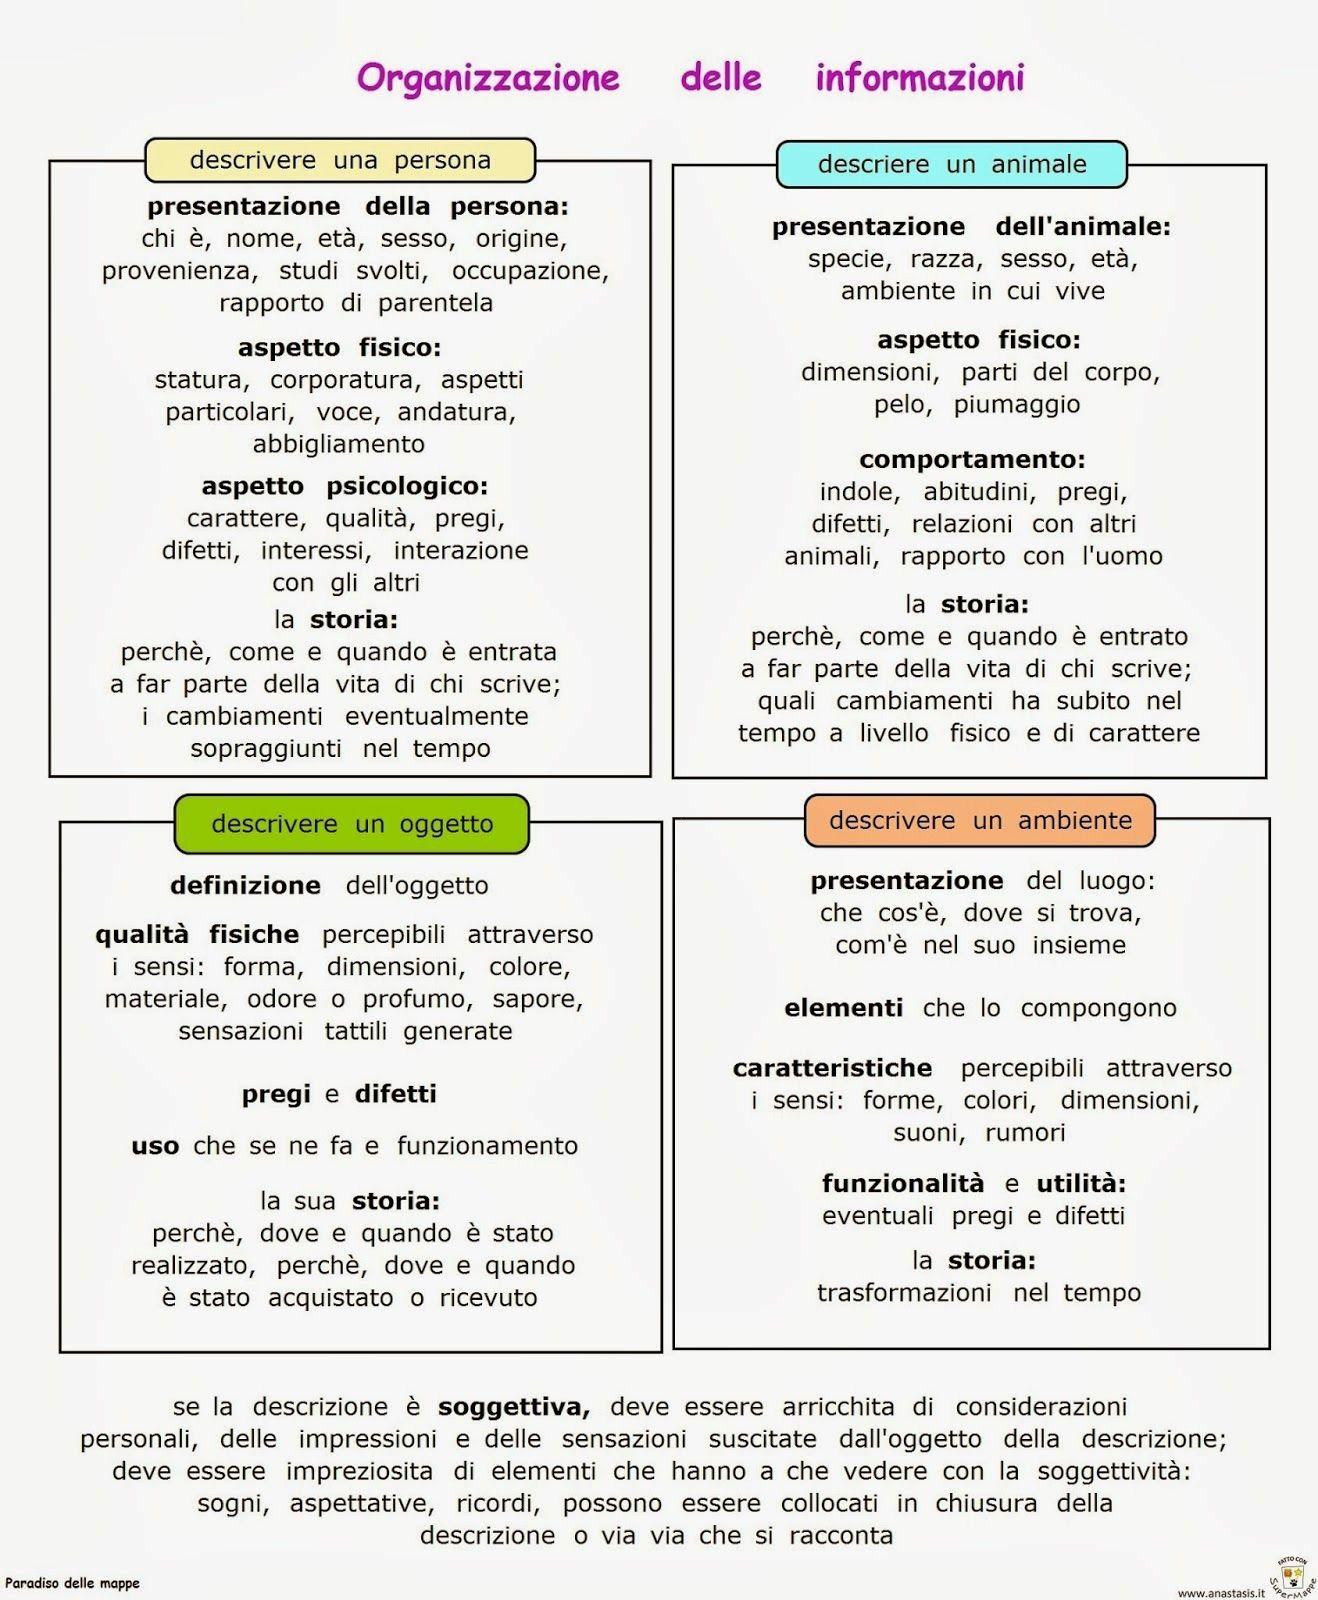 Pin By Afrodita On Learning Italian